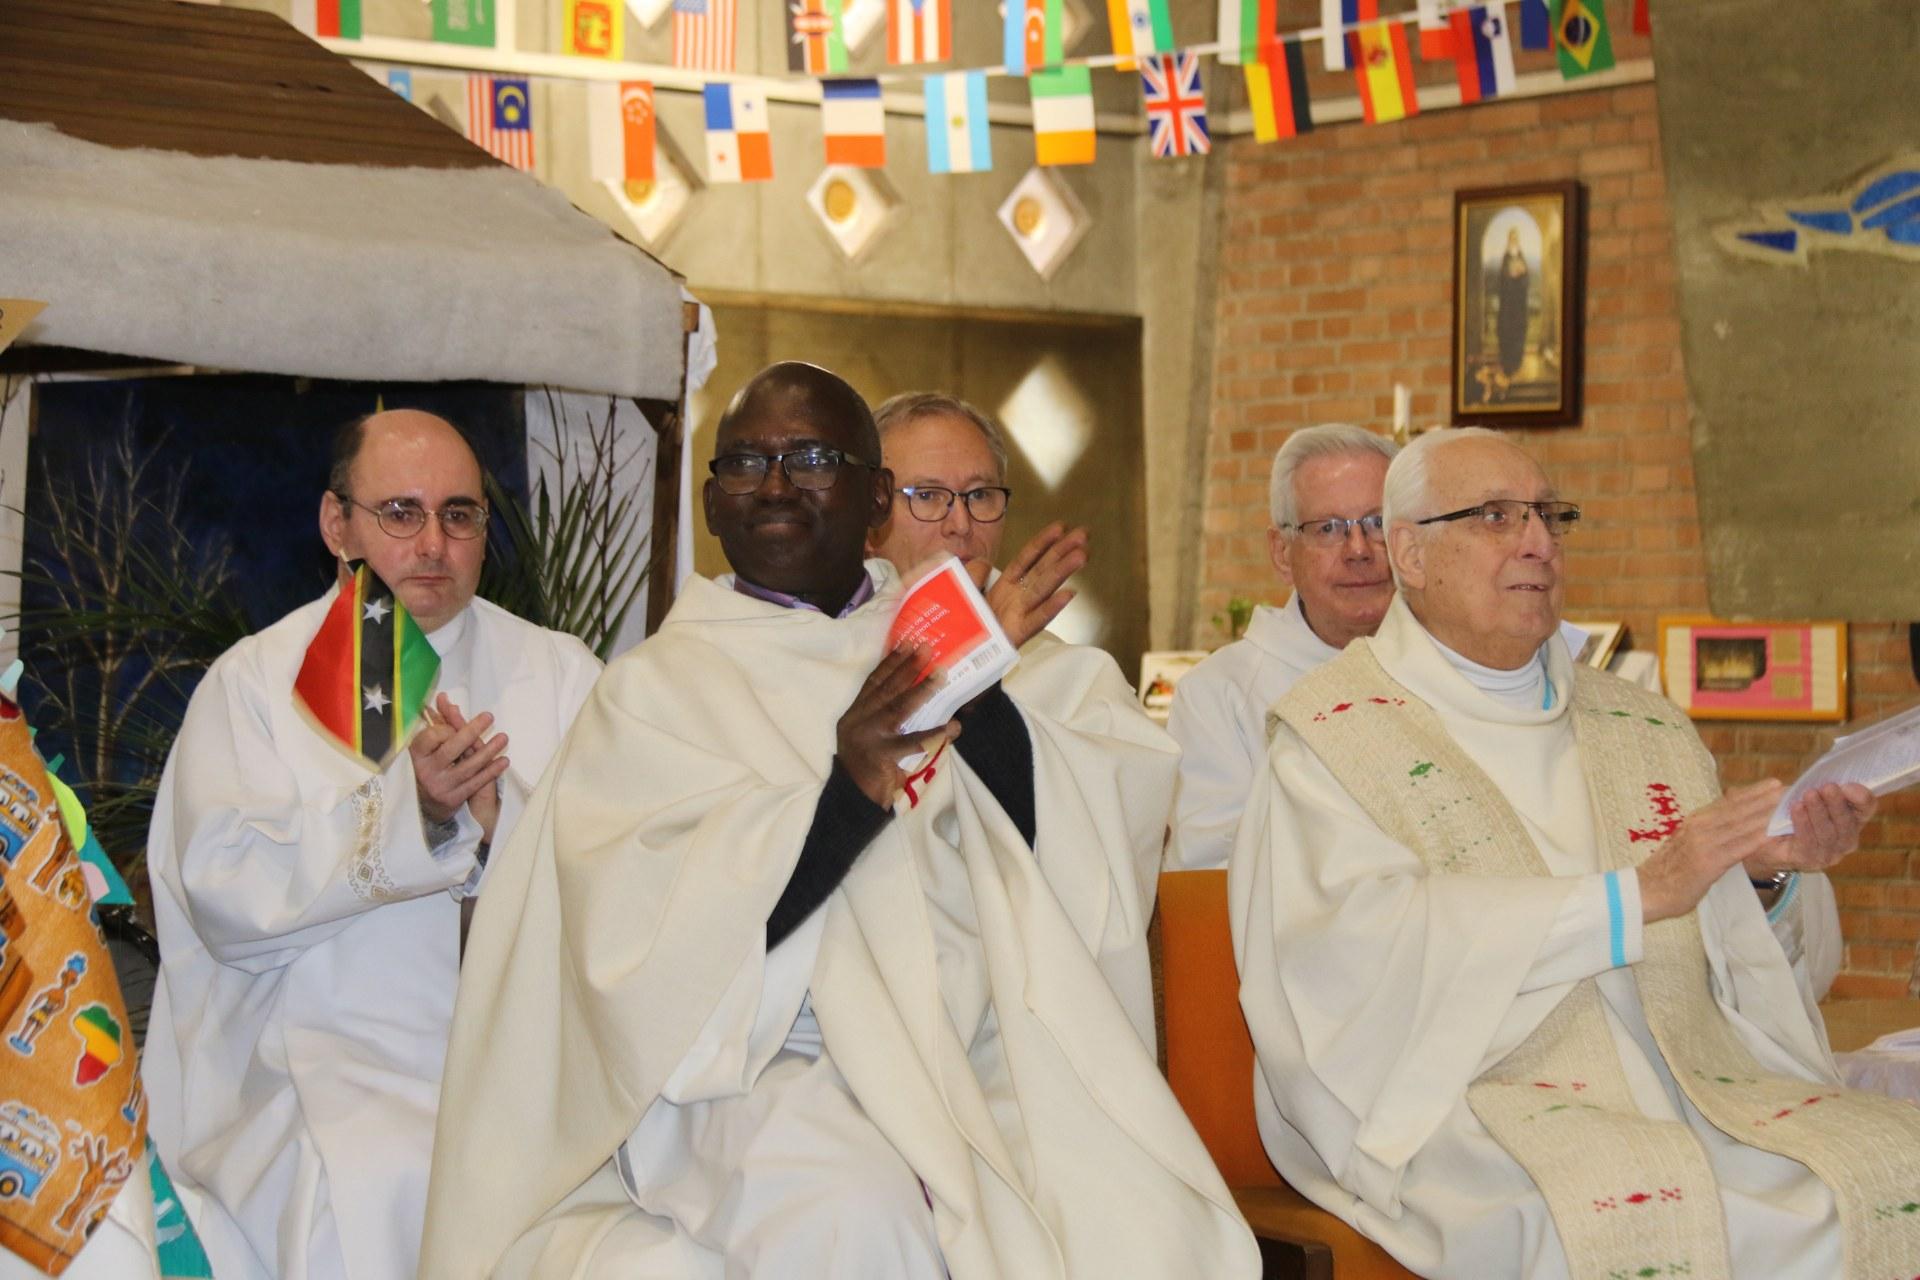 Messe des Nations 98